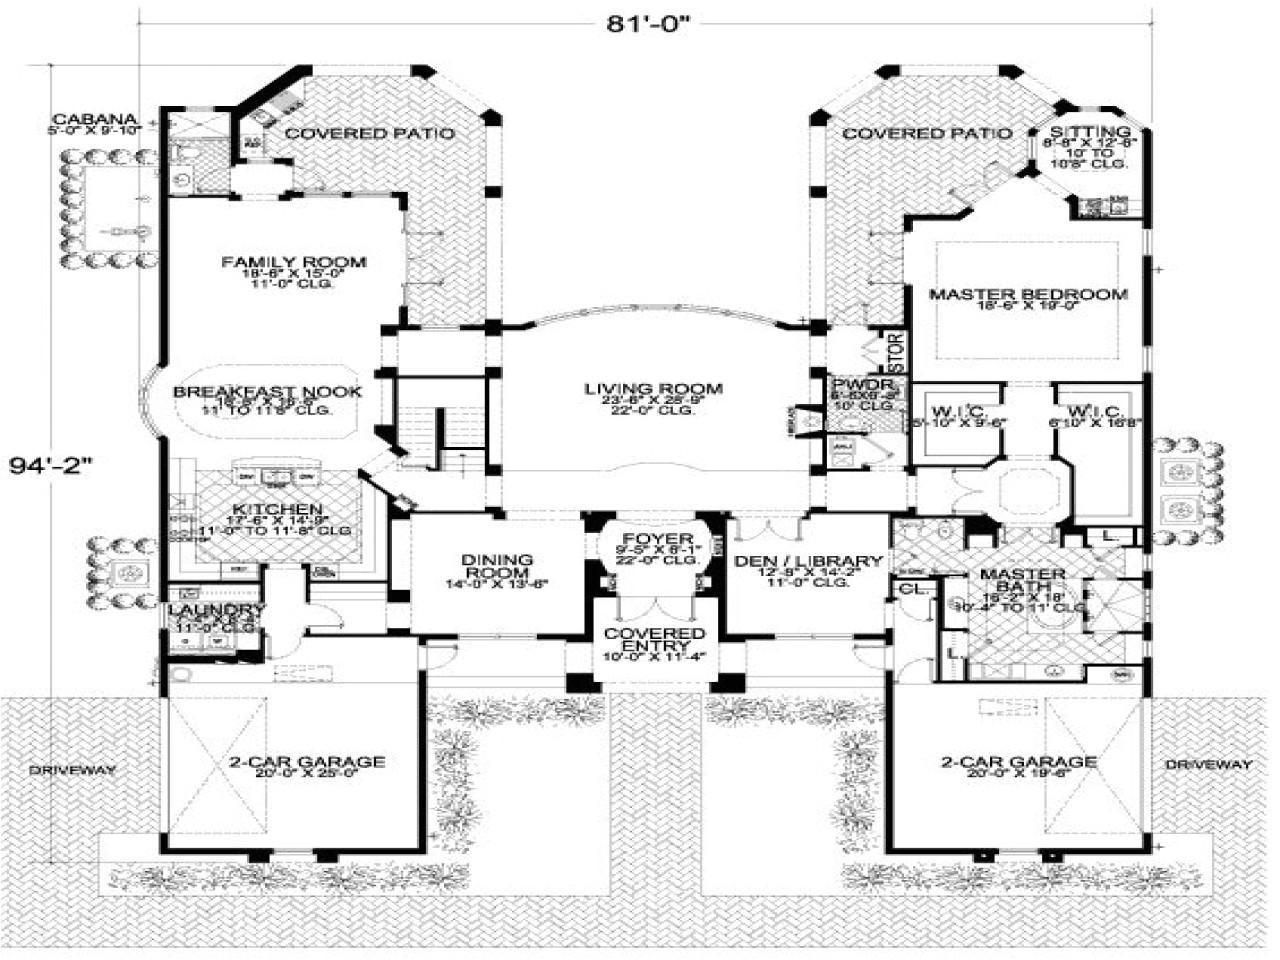 d0fdc98fcbb16673 large single story floor plans 3 story brownstone floor plans